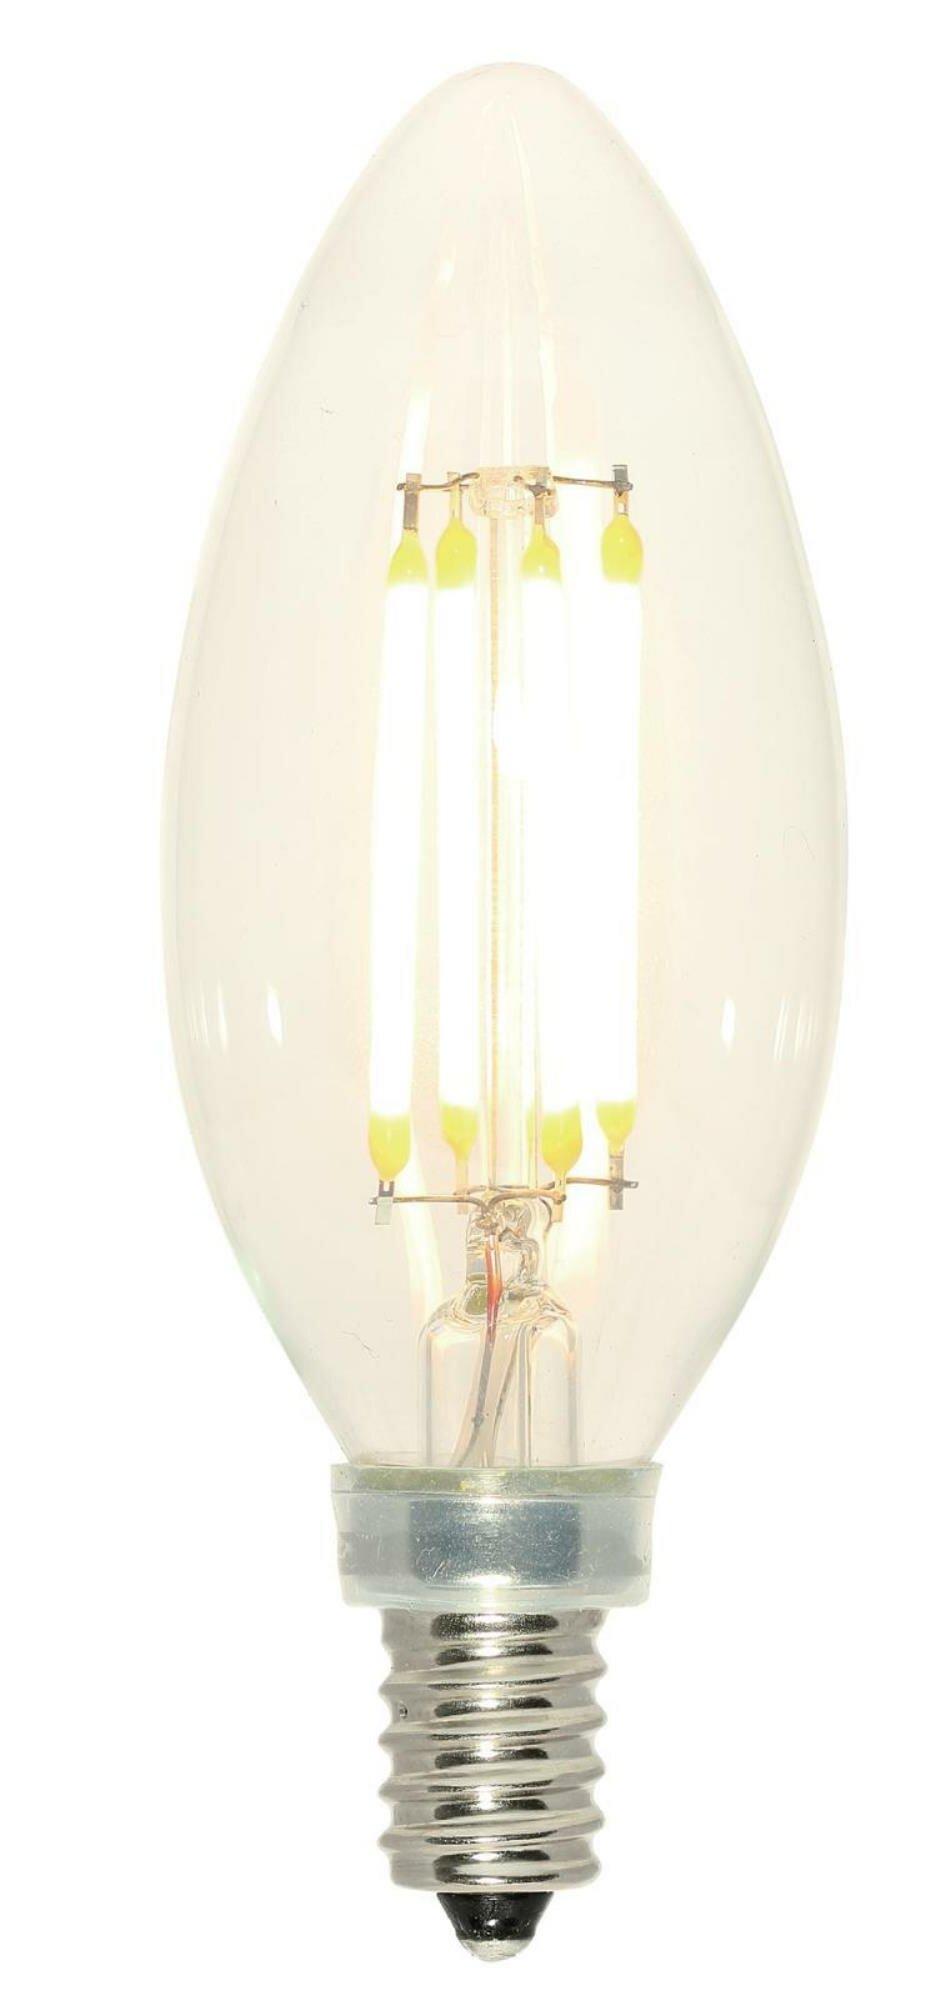 Westinghouse Lighting 60 Watt Equivalent E12 Dimmable Led Edison Candle Light Bulb Reviews Wayfair